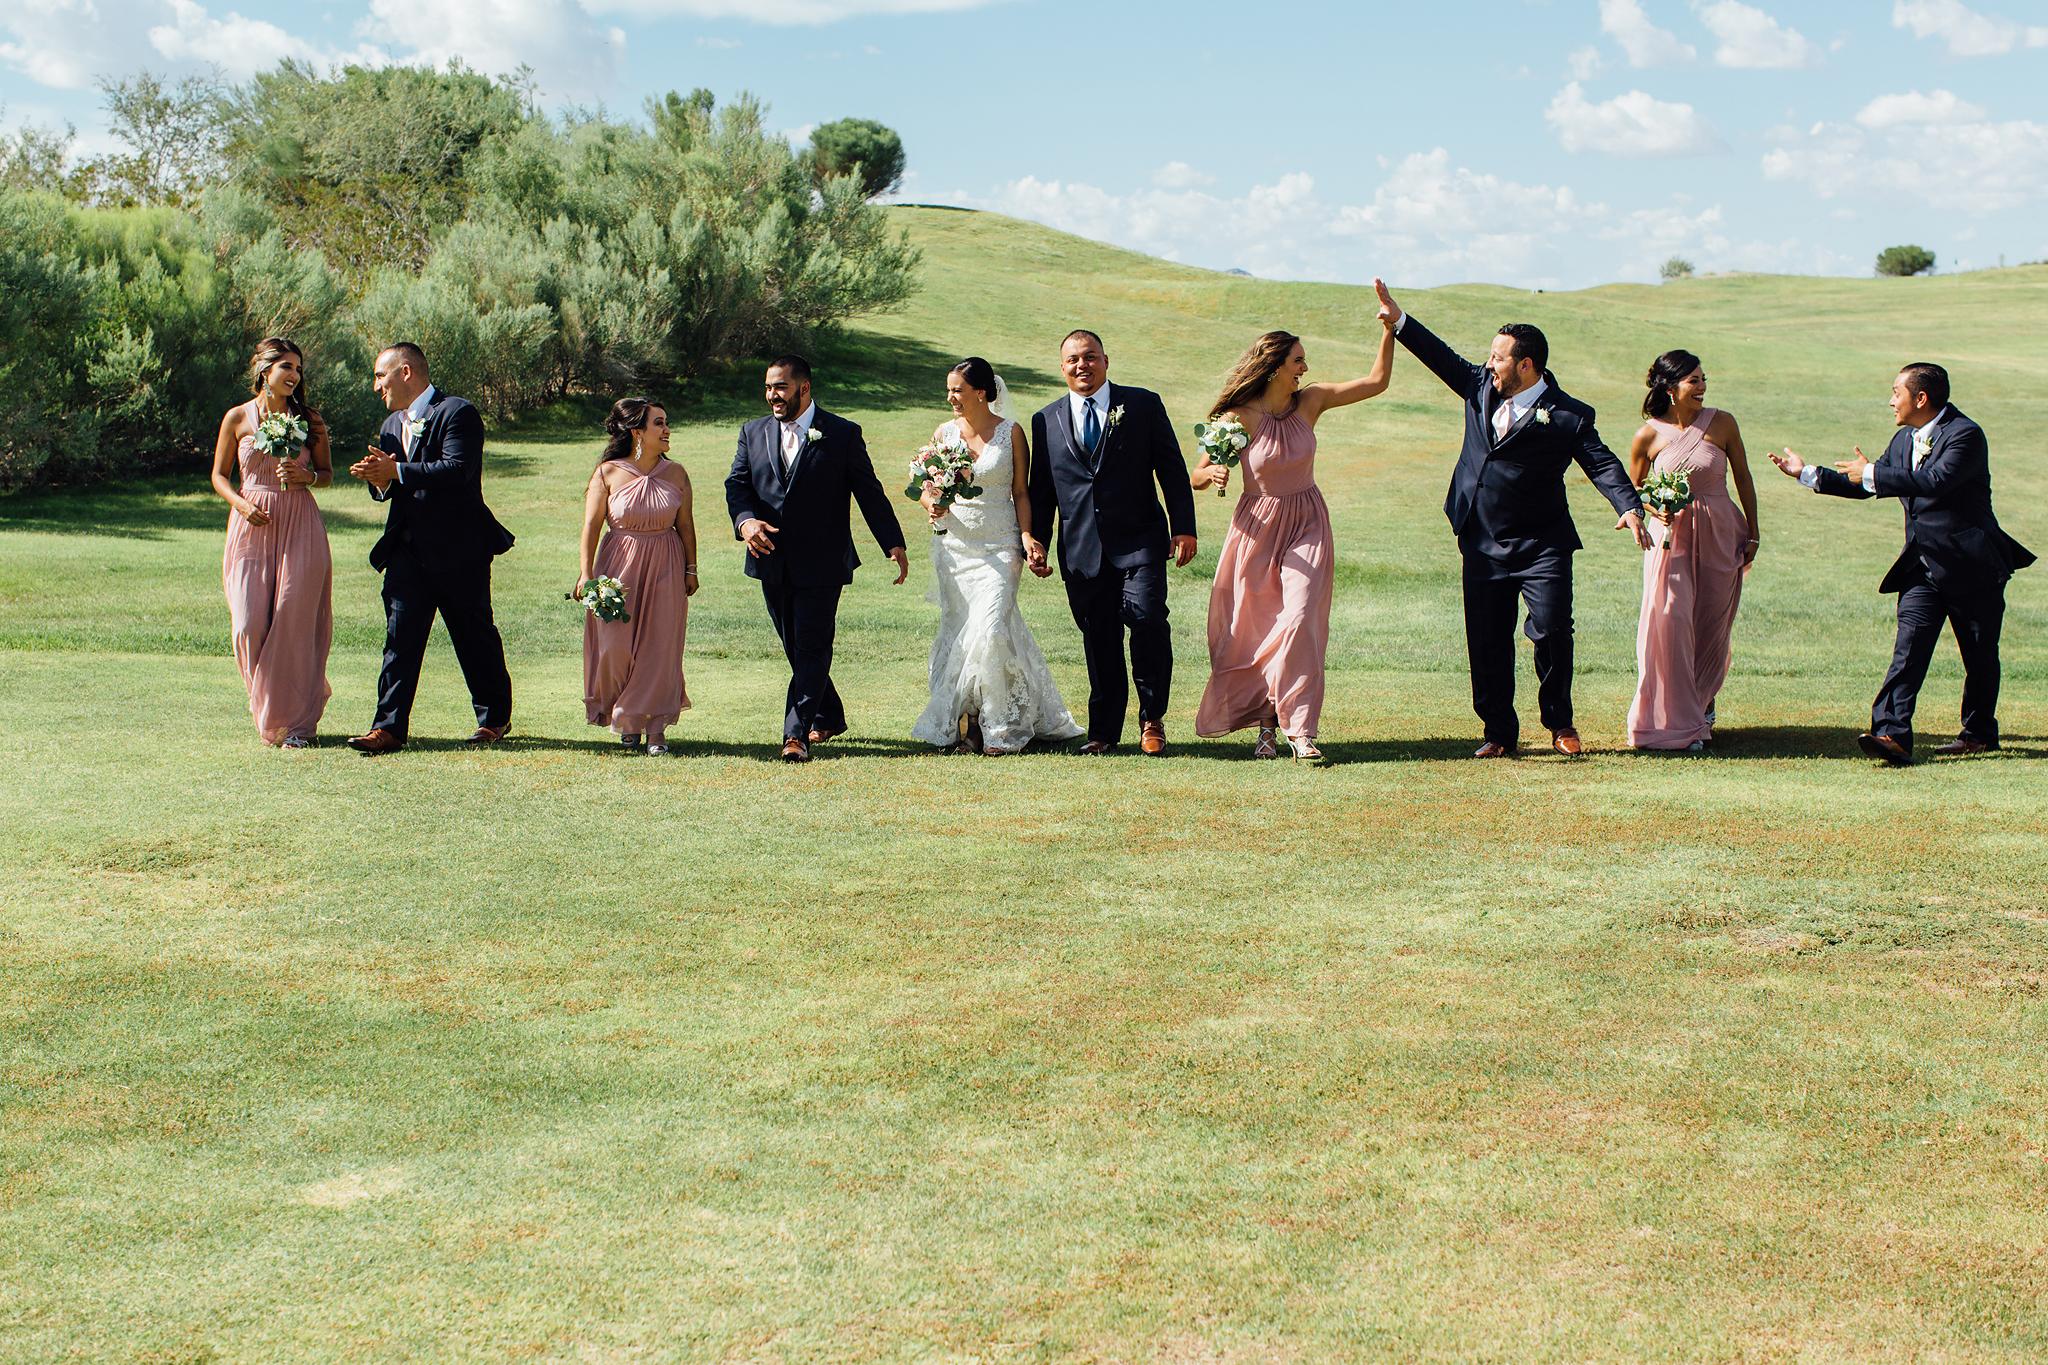 sonoma-ranch-wedding_15.jpg